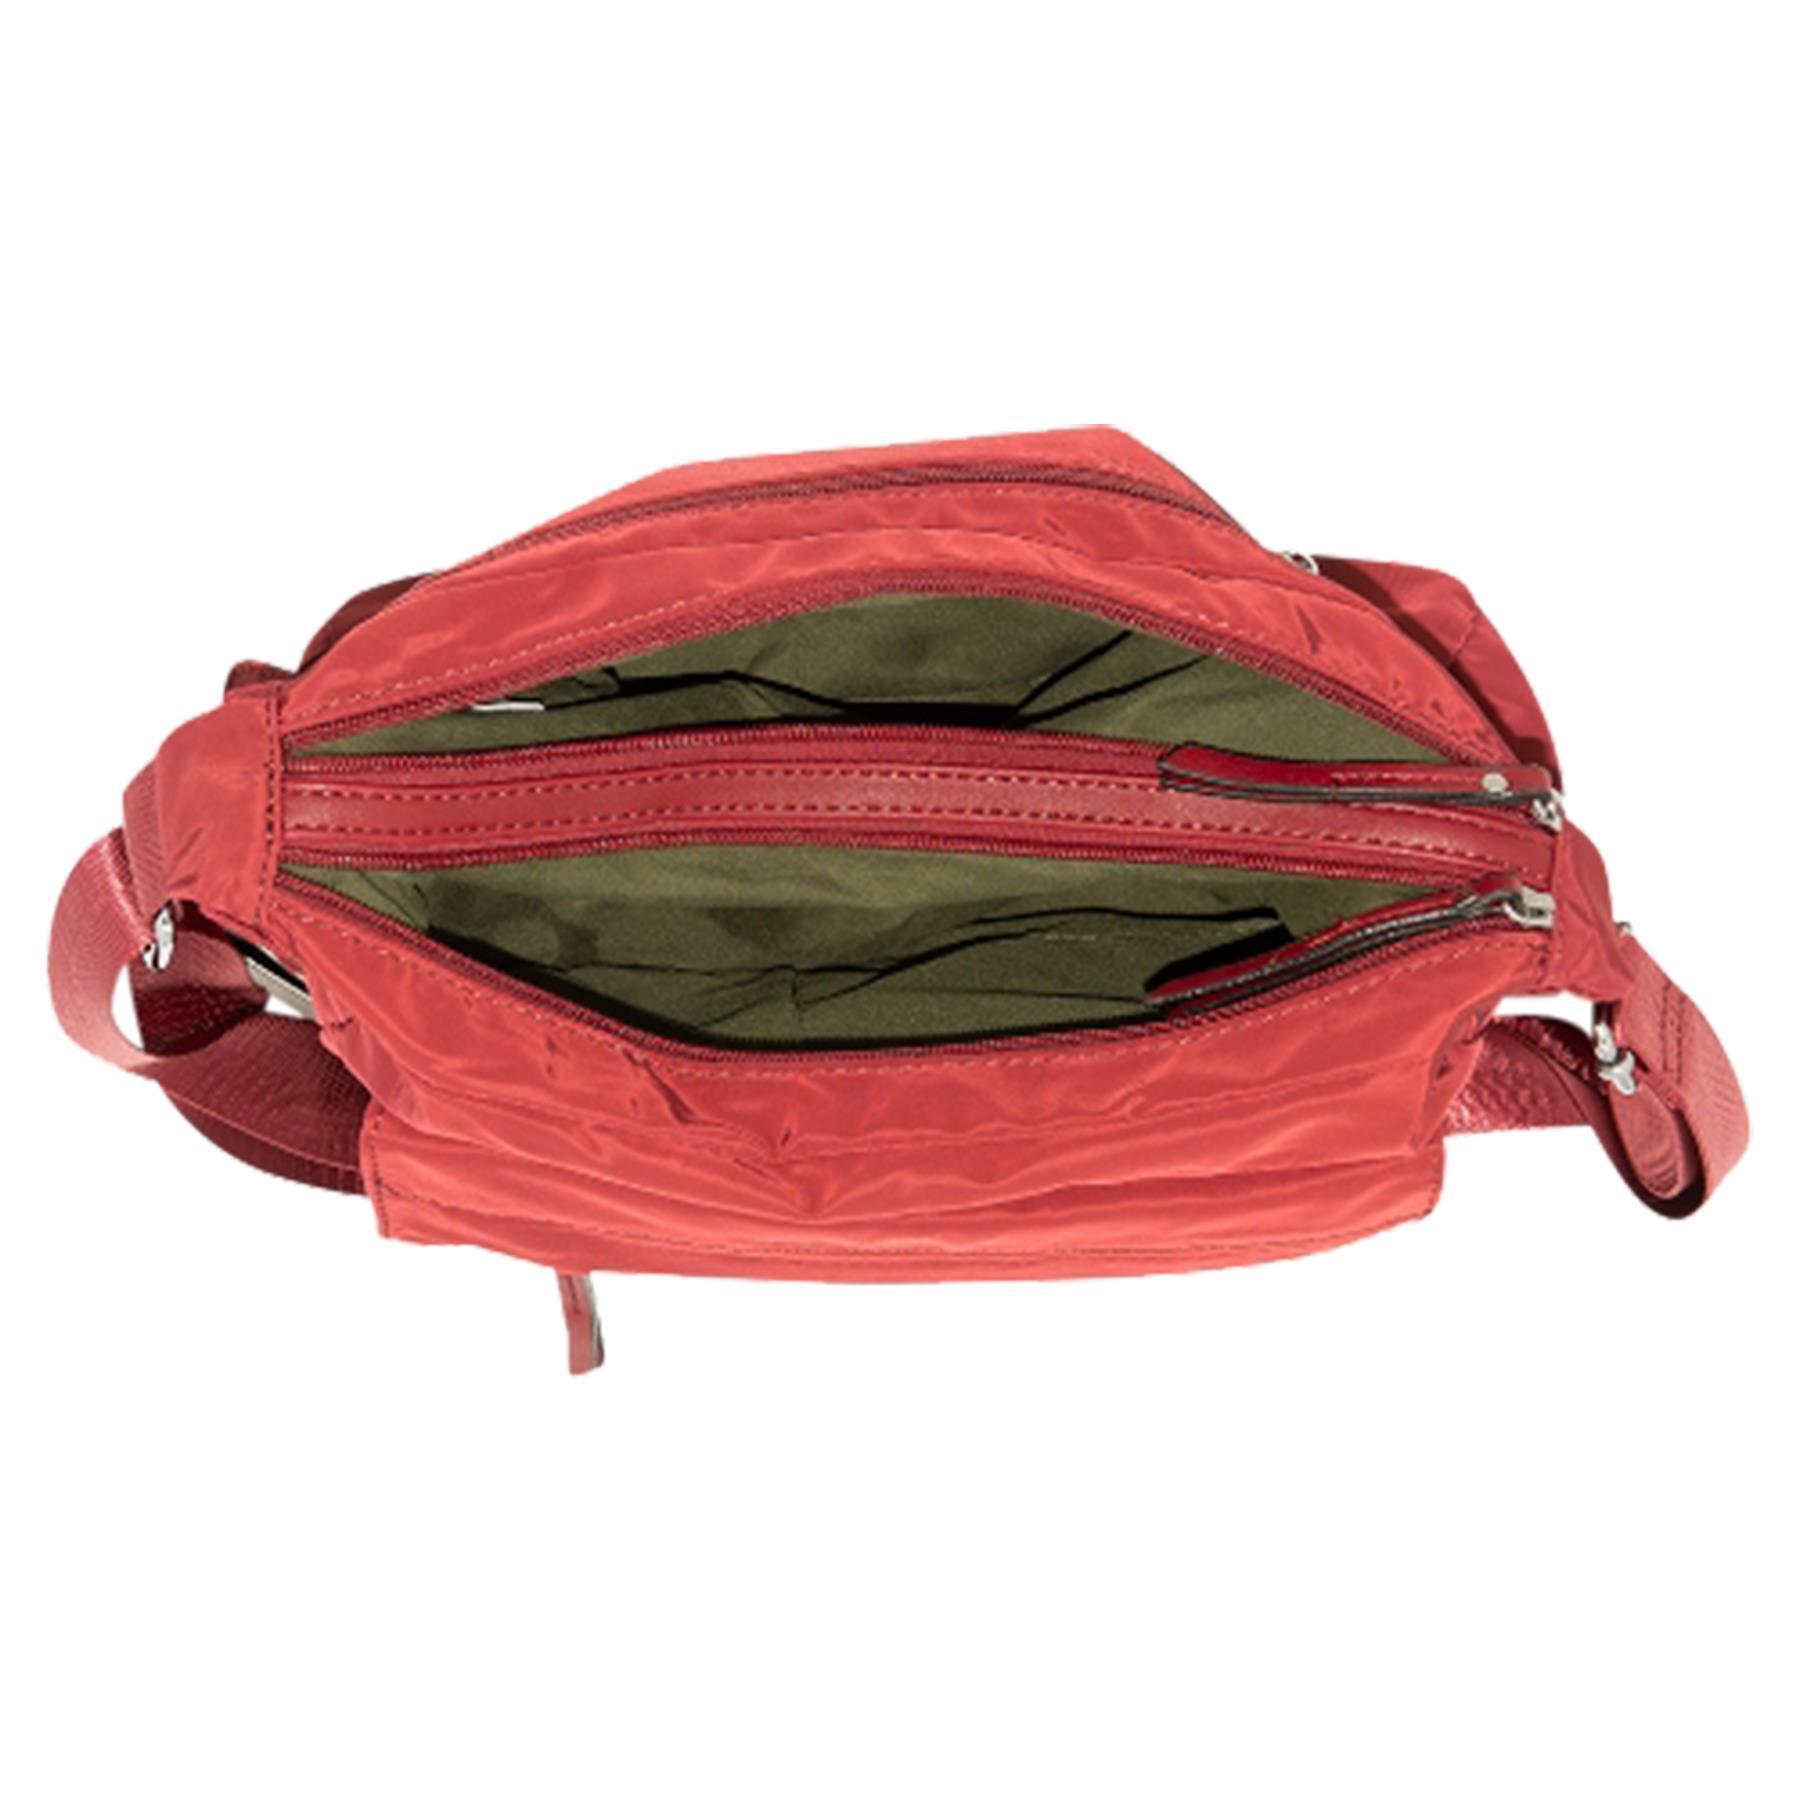 New-Ladies-Men-s-Showerproof-School-College-Practical-Basic-Crossbody-Bag thumbnail 36